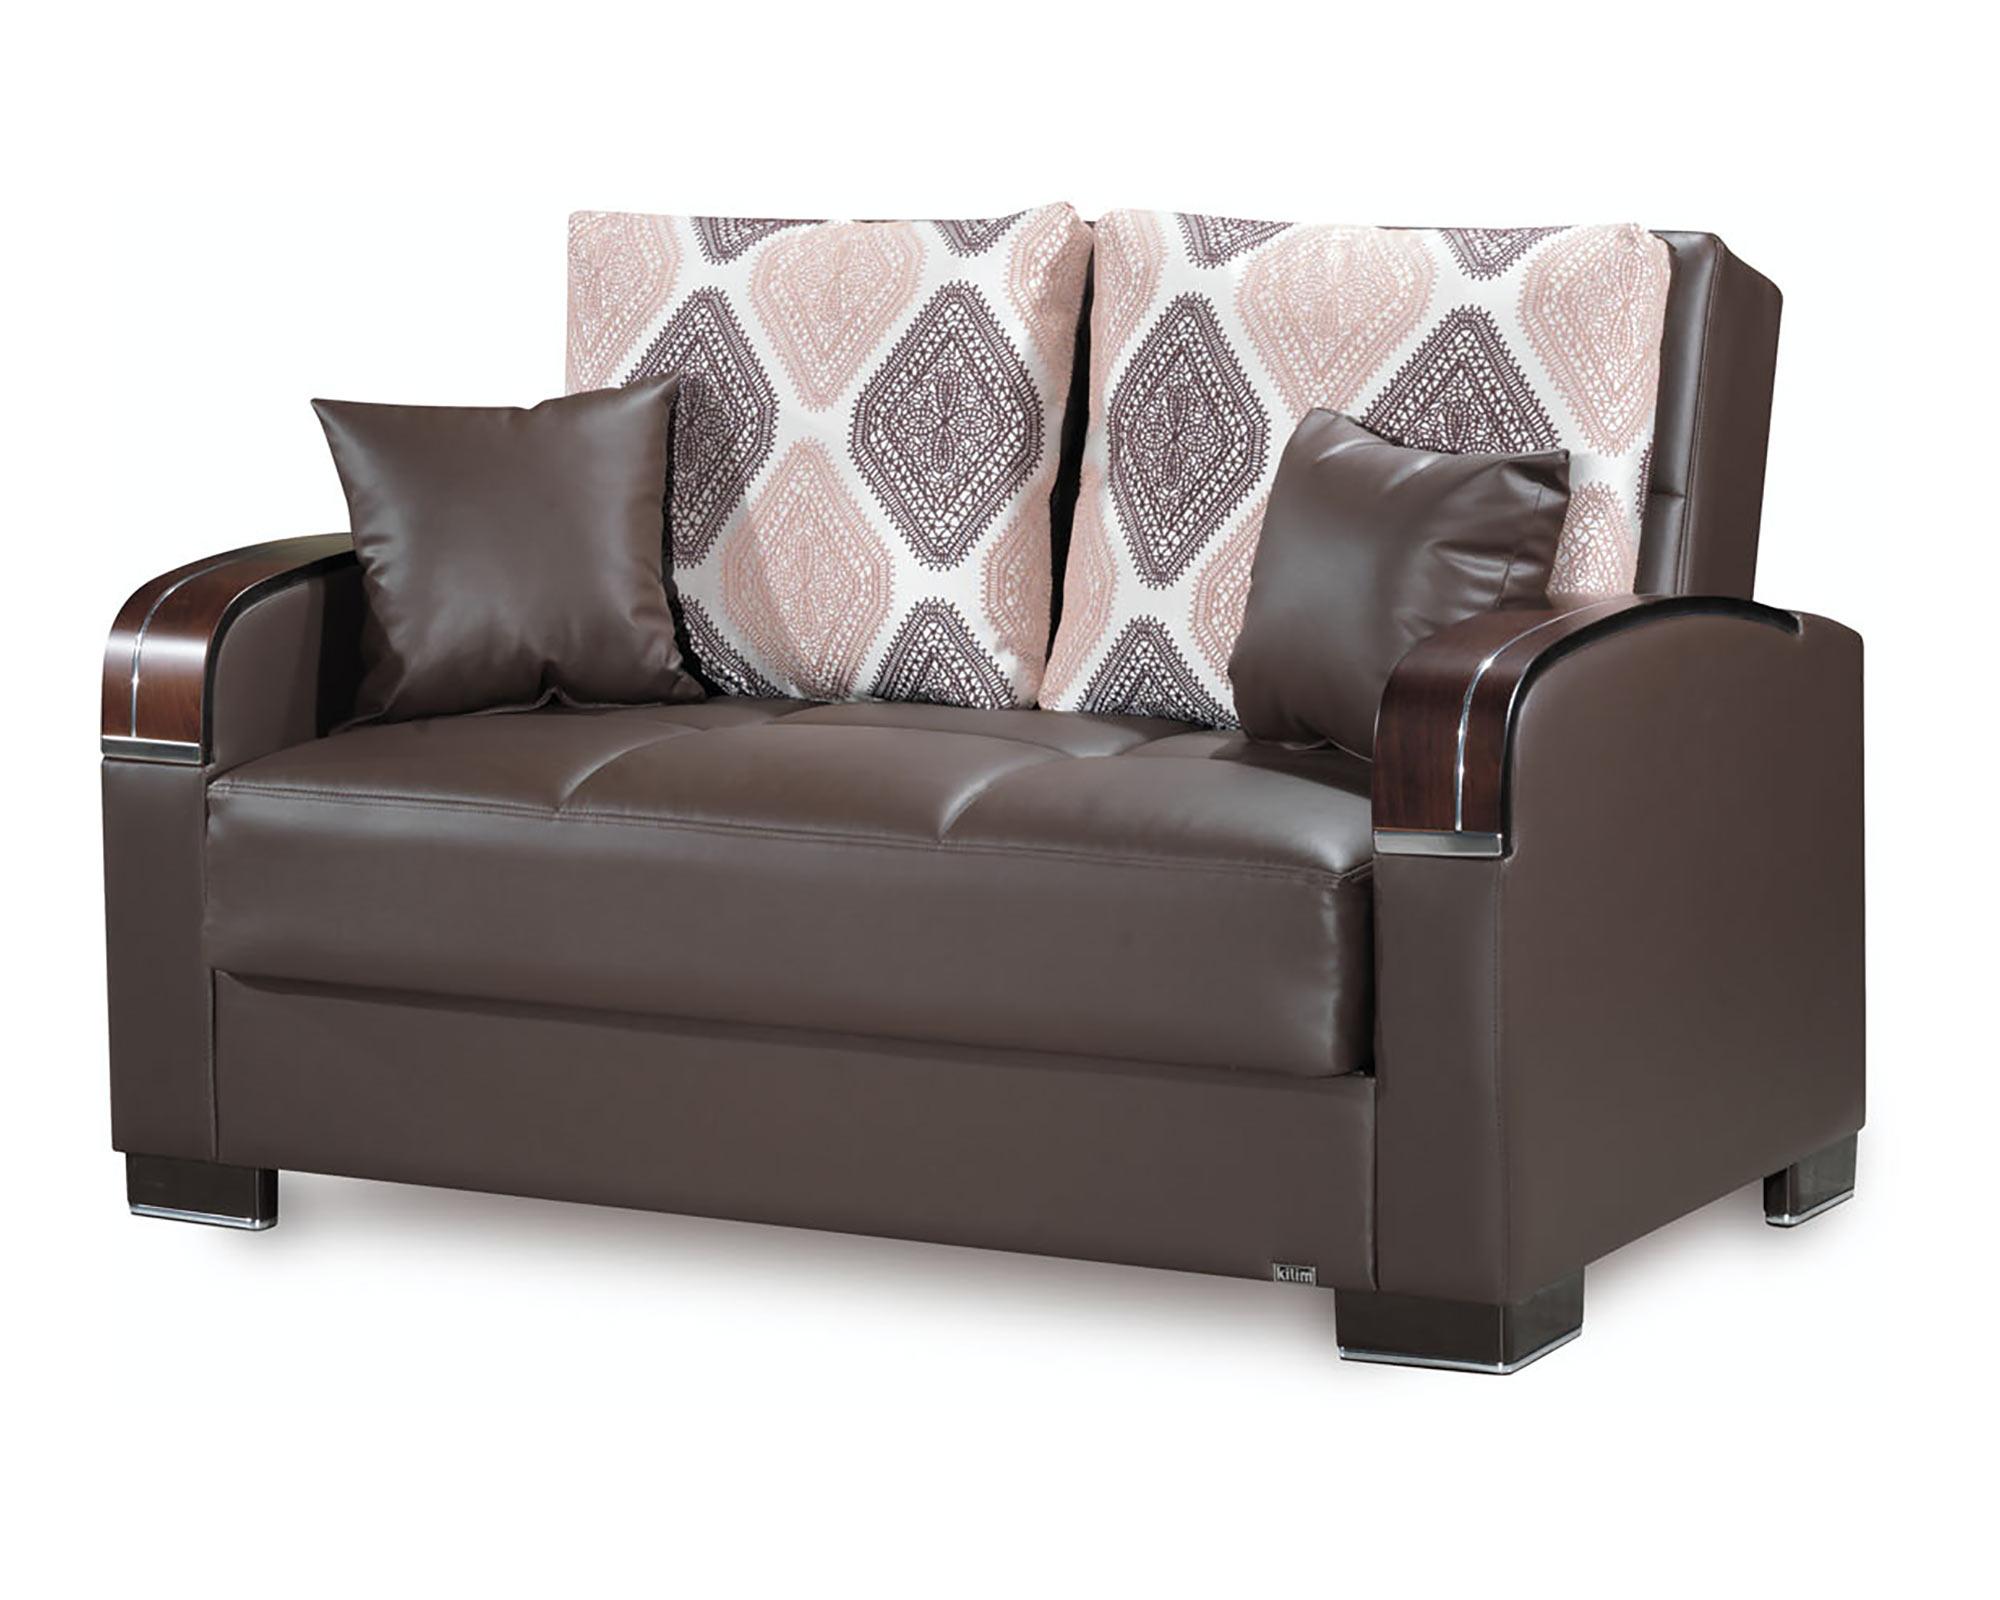 Astonishing Mobimax Brown Pu Leather Convertible Loveseat By Casamode Inzonedesignstudio Interior Chair Design Inzonedesignstudiocom